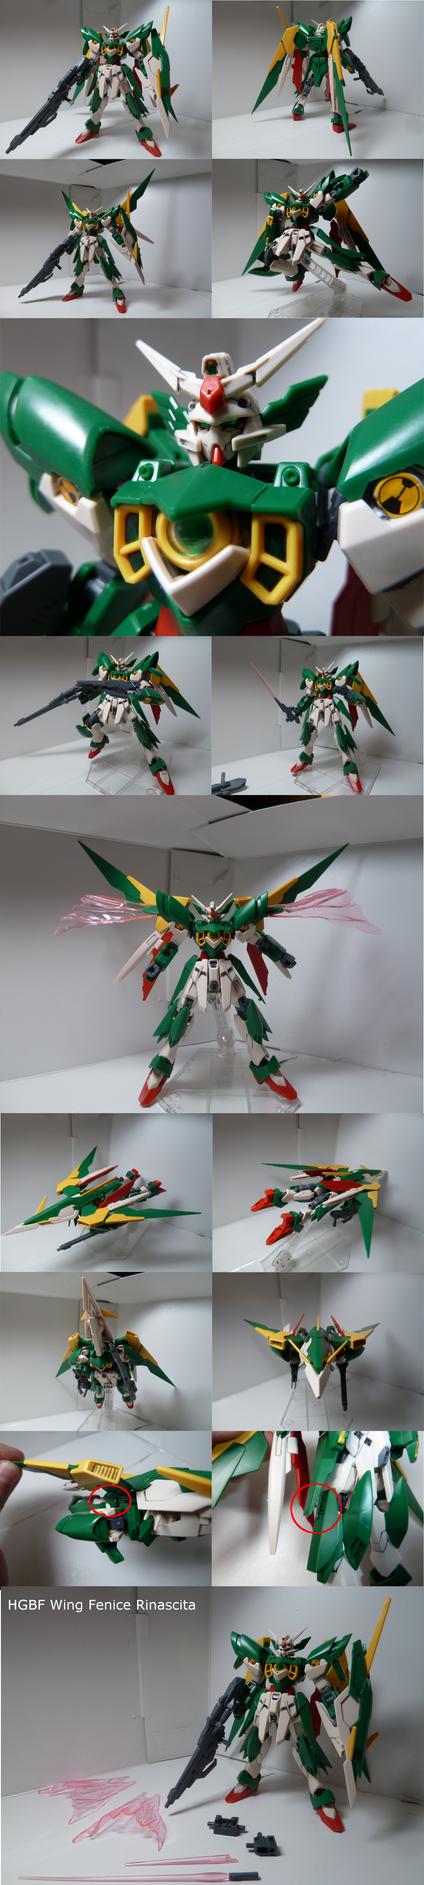 Wing Gundam Fenice Rinascita Review by Blayaden